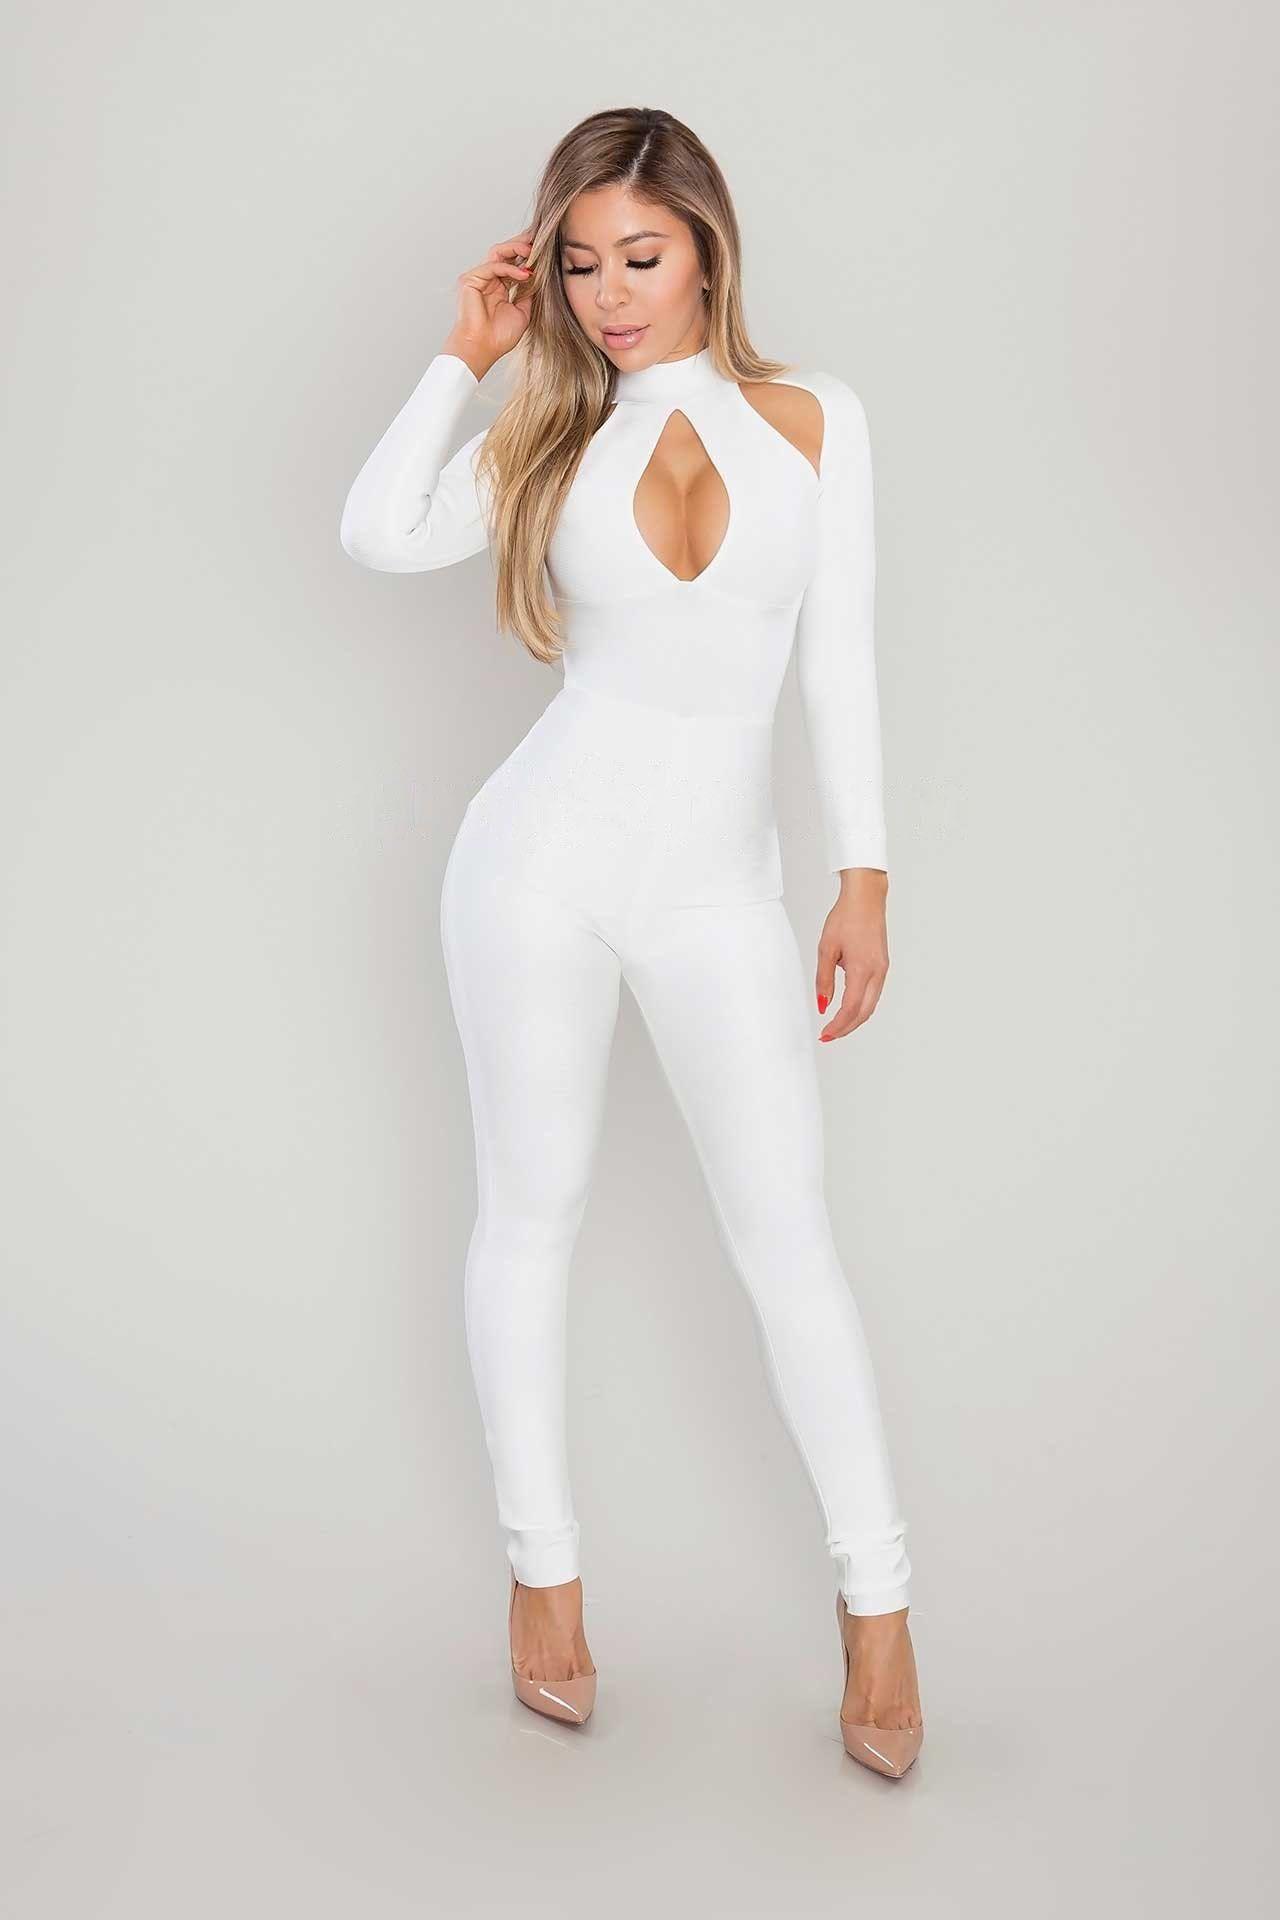 11a16a4ff7b Kennedi Bandage Jumpsuit - White